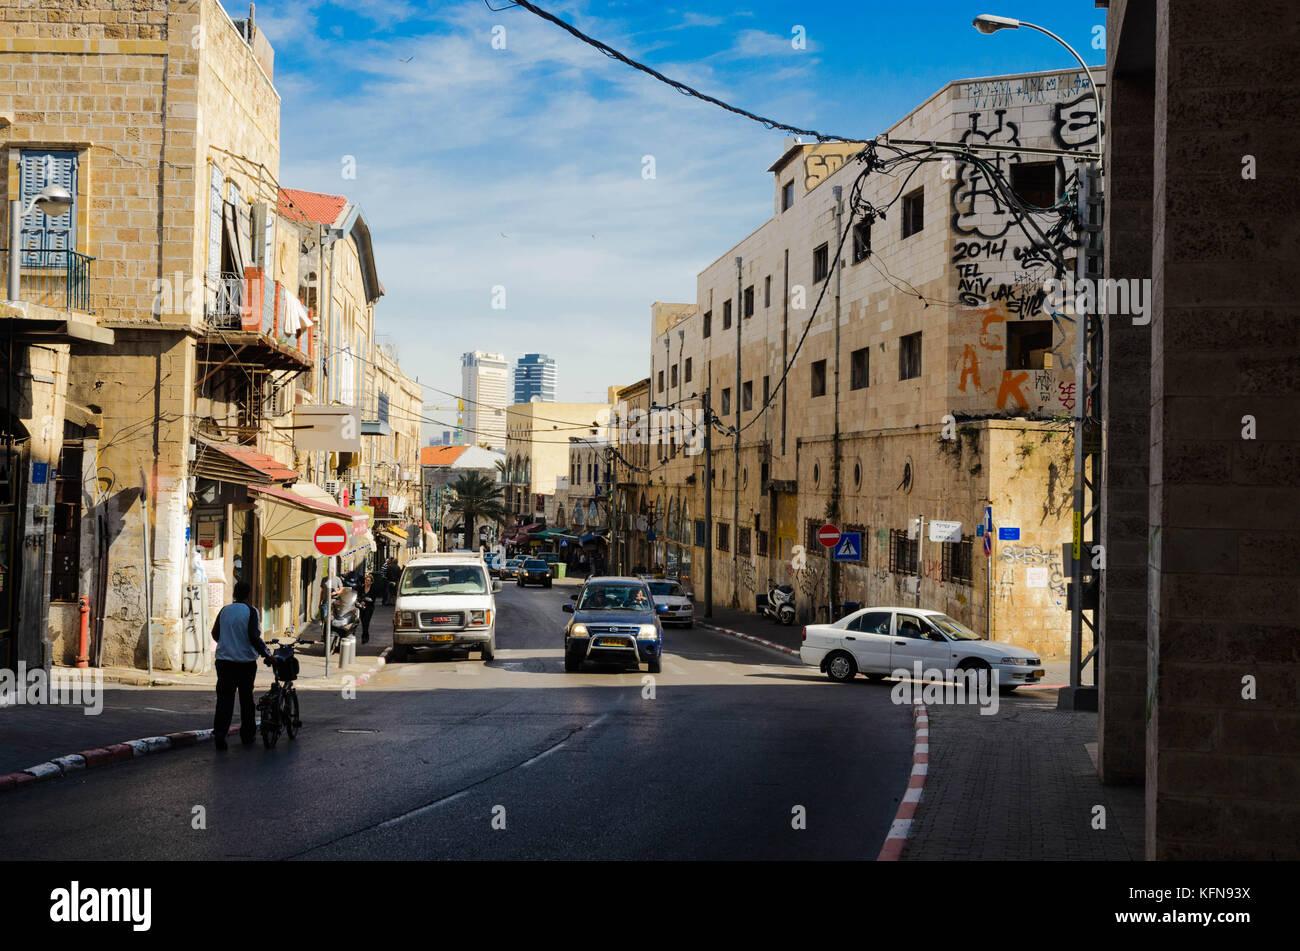 Tel Aviv e Vecchia Jaffa, Israele Immagini Stock